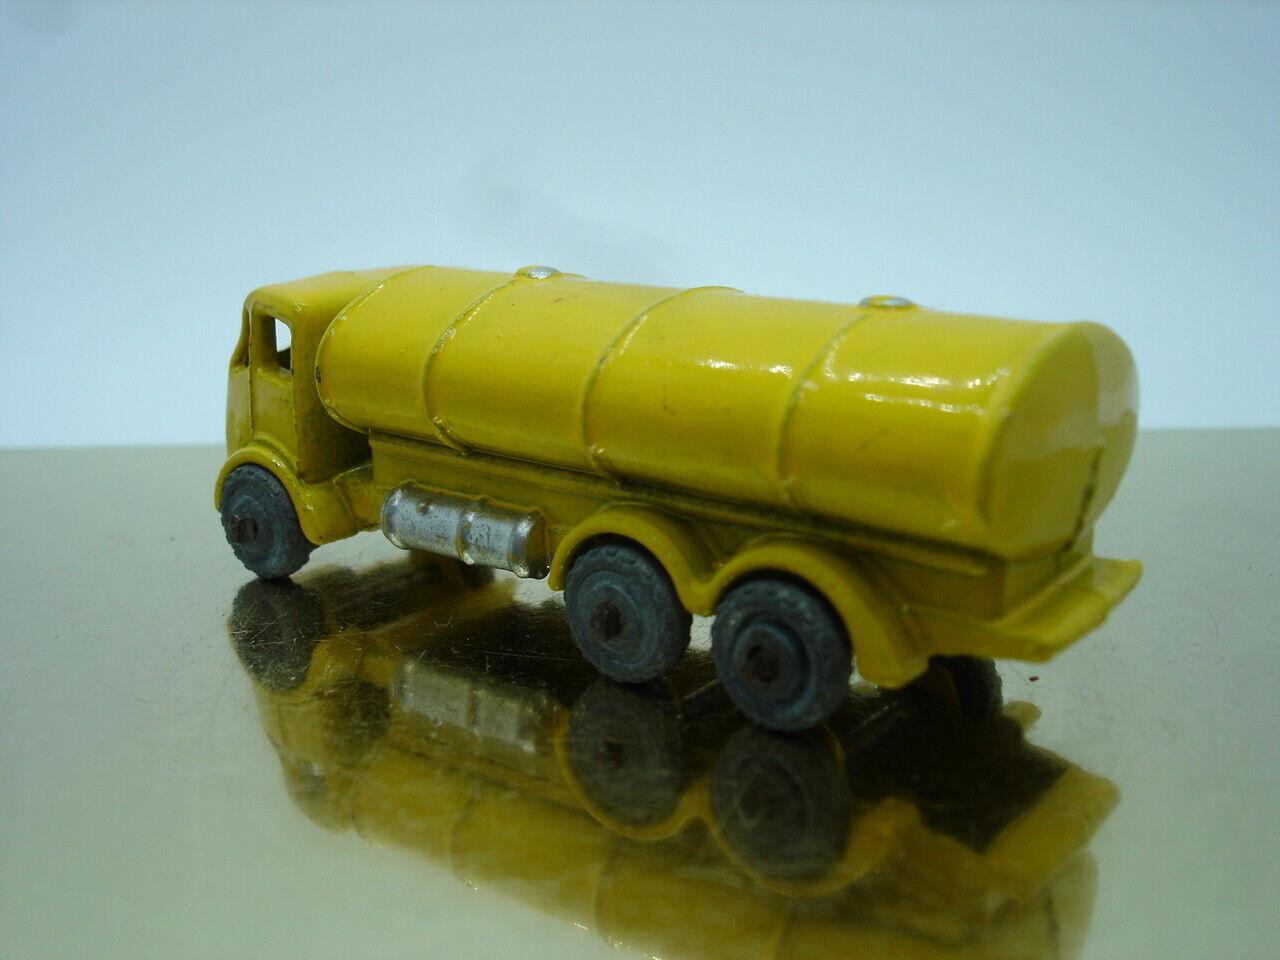 lo último Matchbox 1-75 Moko Lesney nº 11 a petrol petrol petrol petrolero amarillo 1955 53mm metallr  precios mas bajos